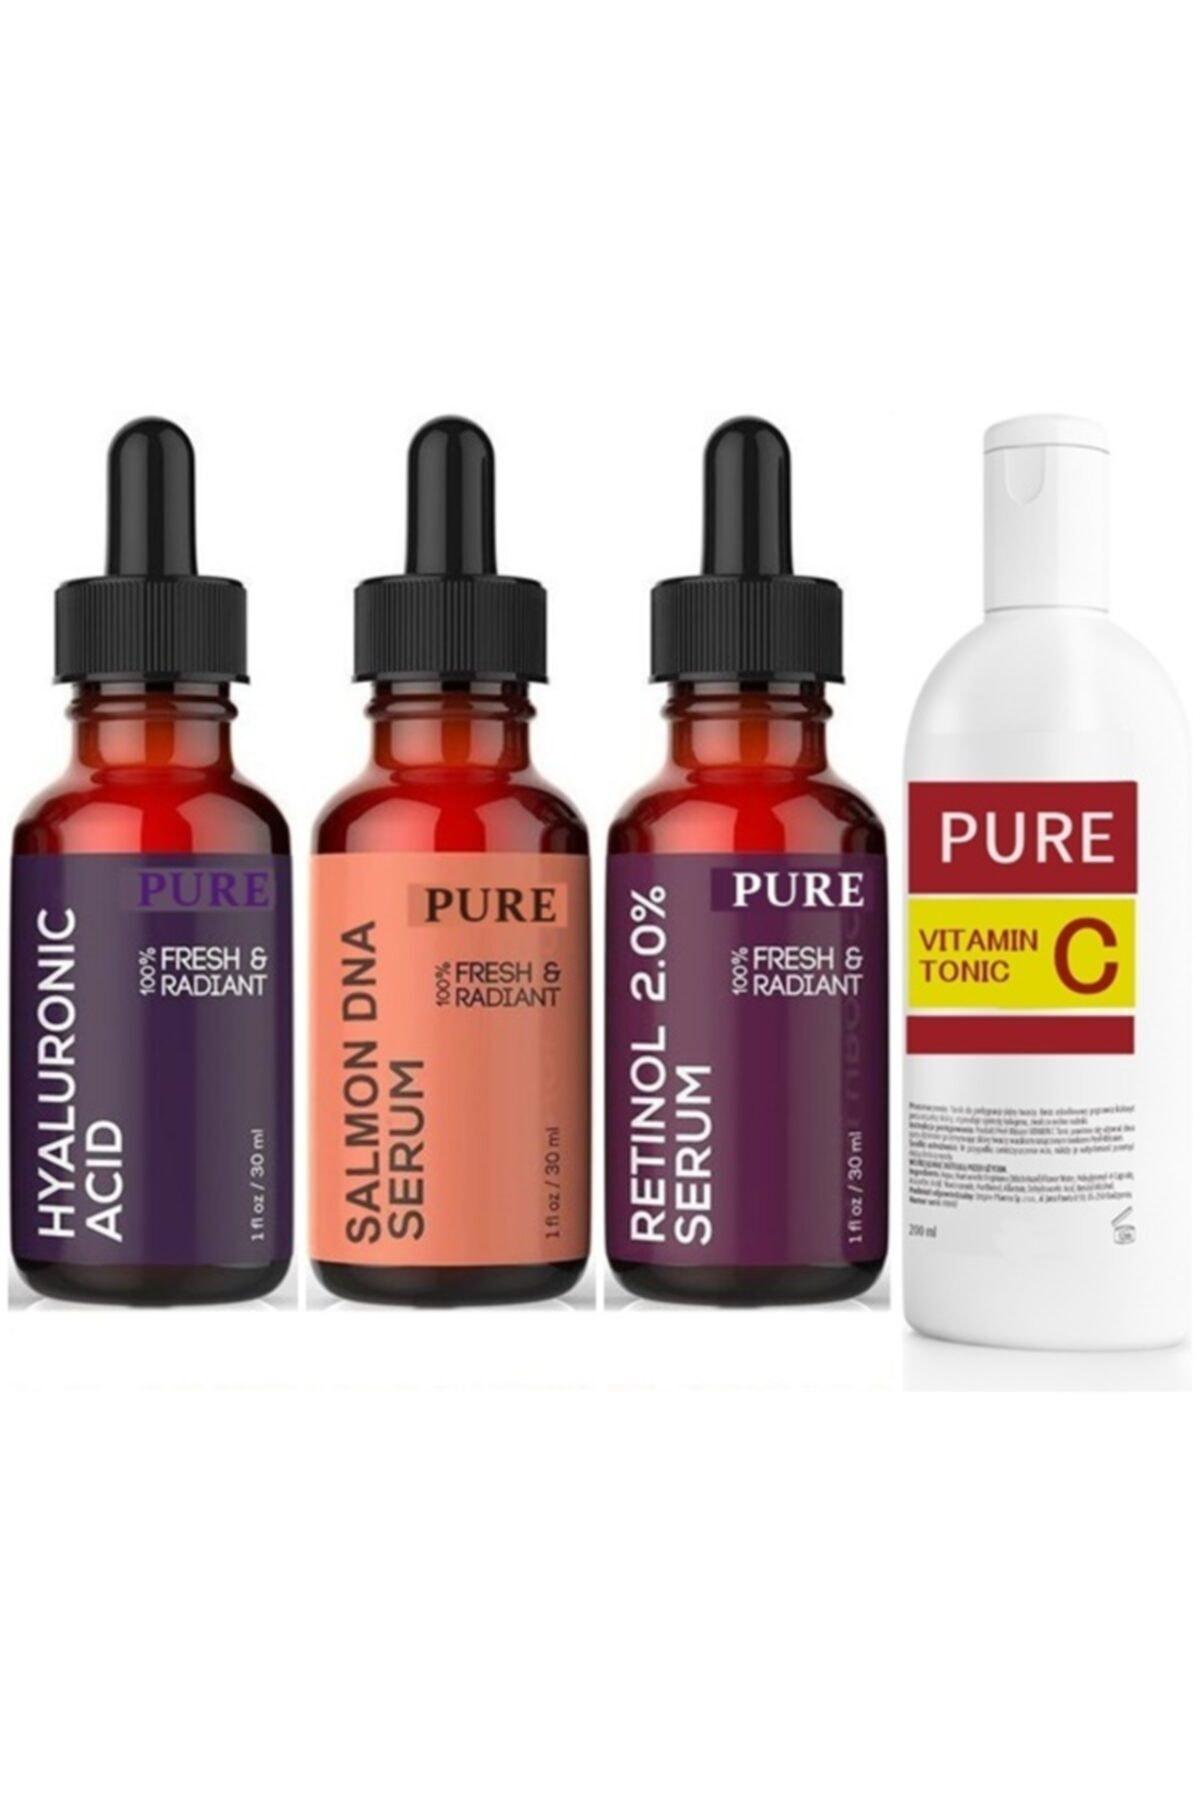 Pure Somon Dna Hyaluronic Acid Retinol Vitamin C Yüz Temizleme Toniği 1